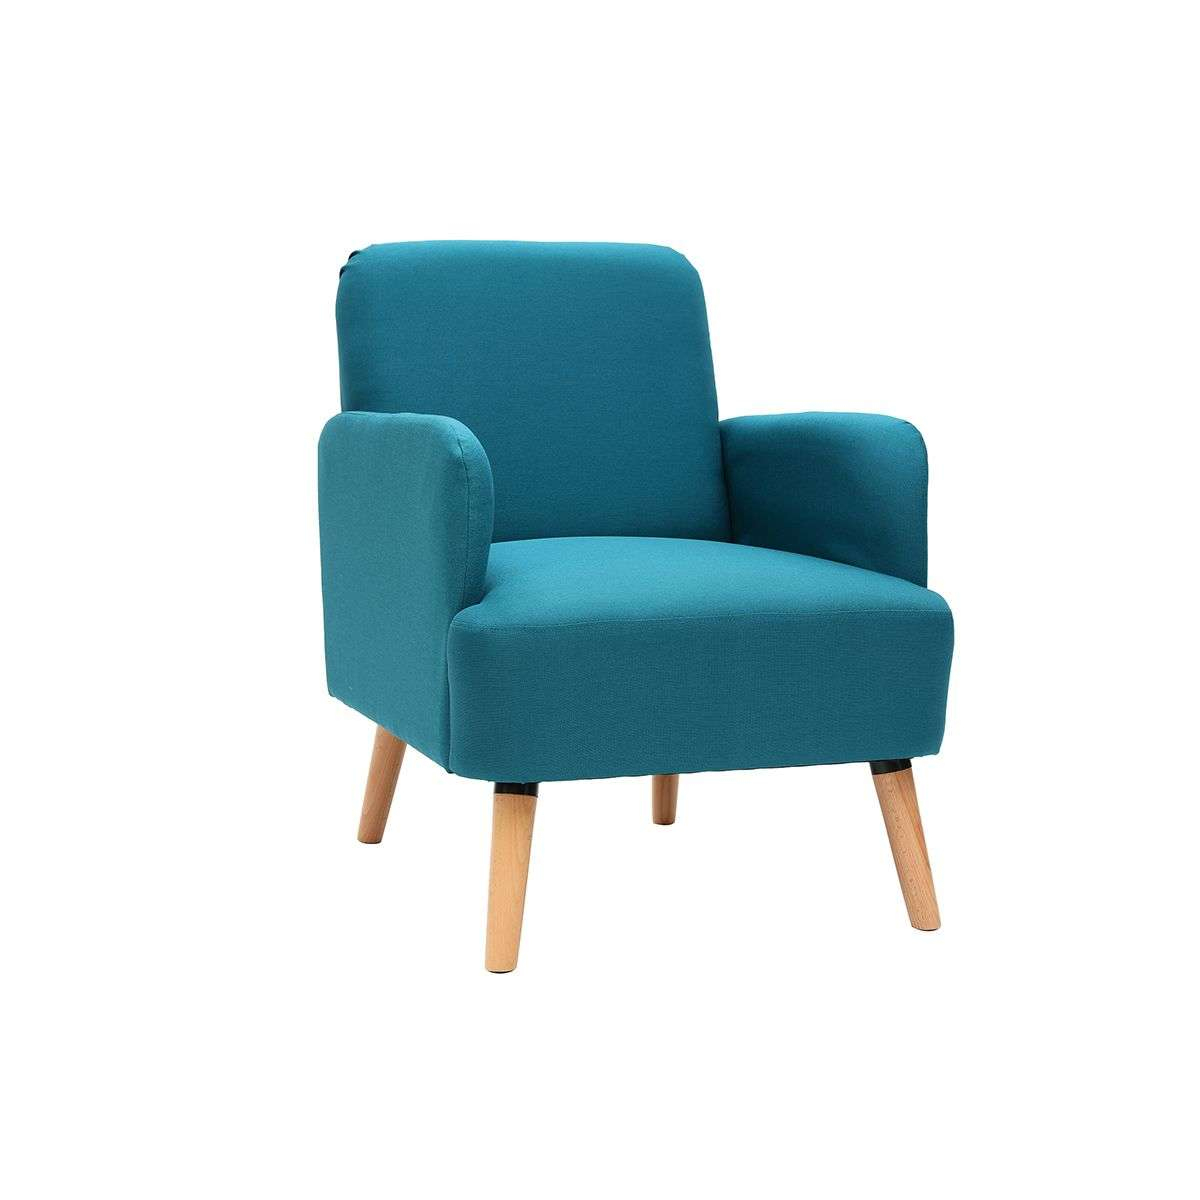 fauteuil scandinave bleu canard et bois